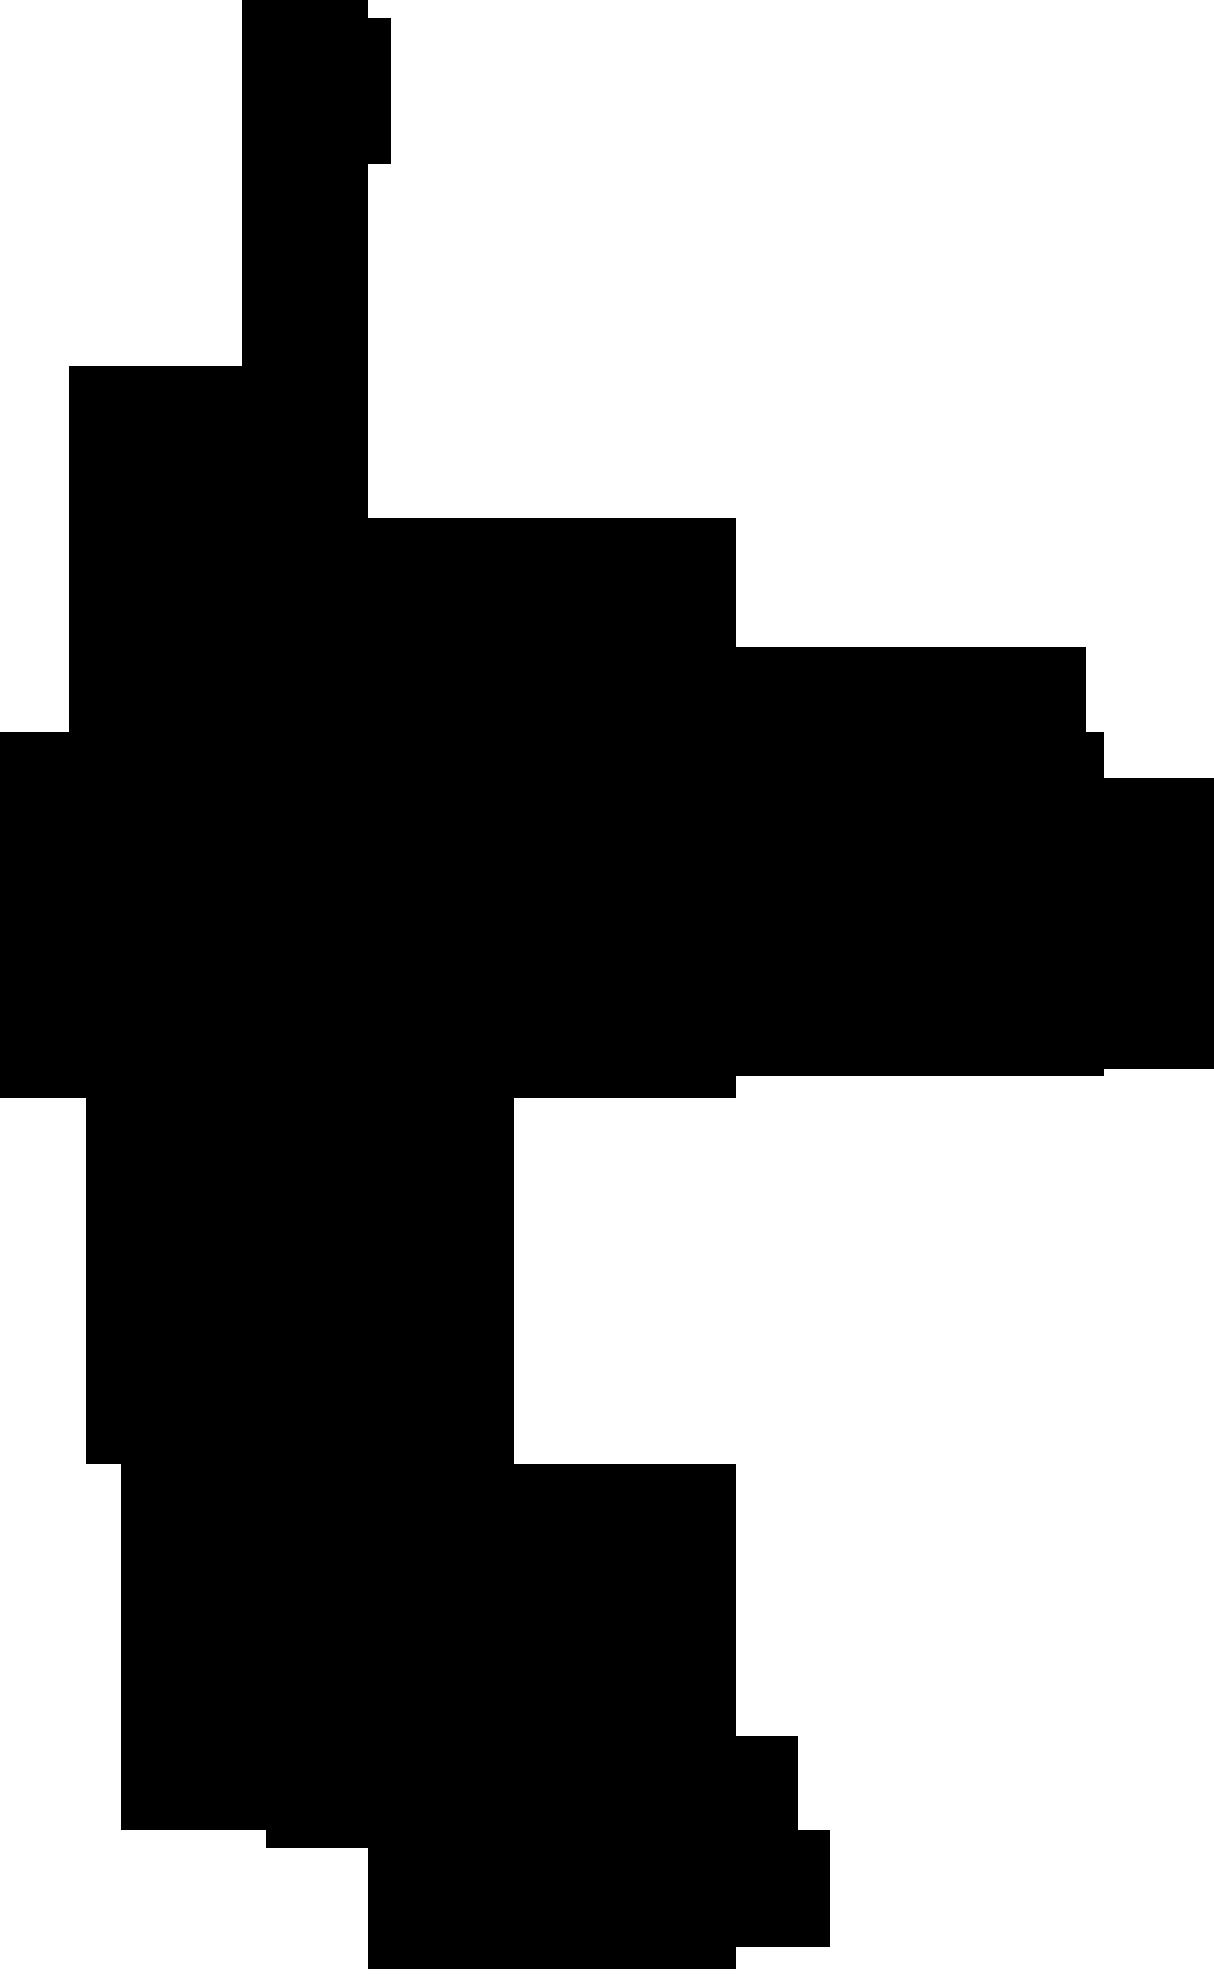 Silhouette shadow logo spread. Clipart rock word